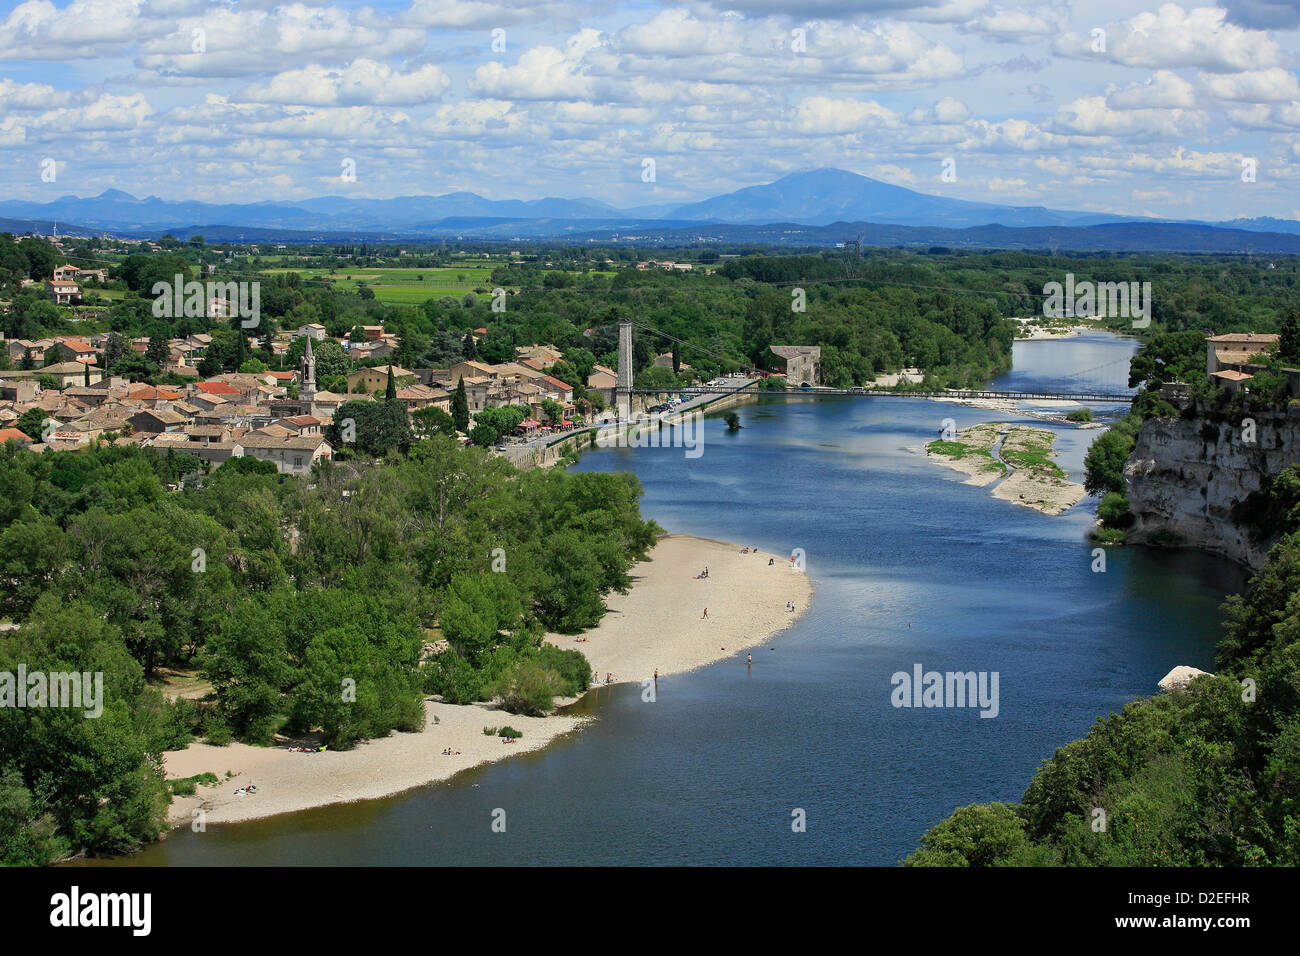 France, Ardeche , Saint-Martin d'Ardèche - Stock Image